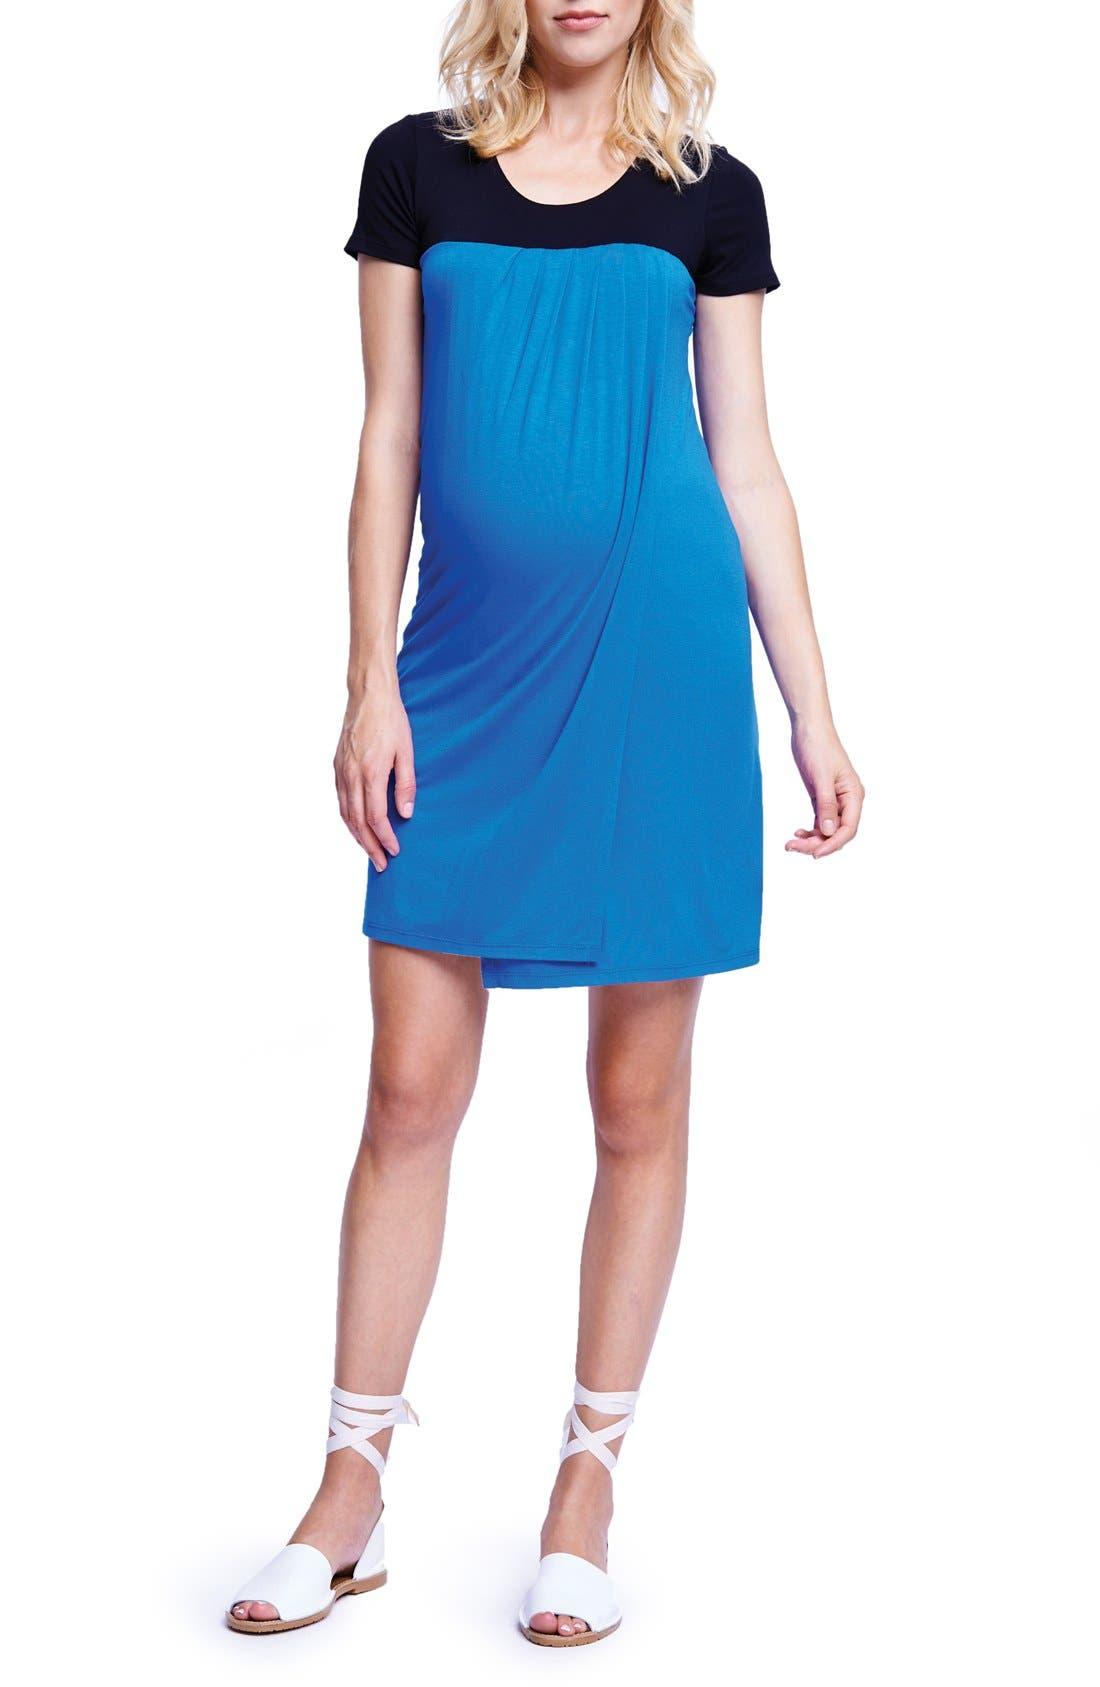 MATERNAL AMERICA Babydoll Maternity/Nursing Dress, Main, color, BLACK/ ROYAL BLUE